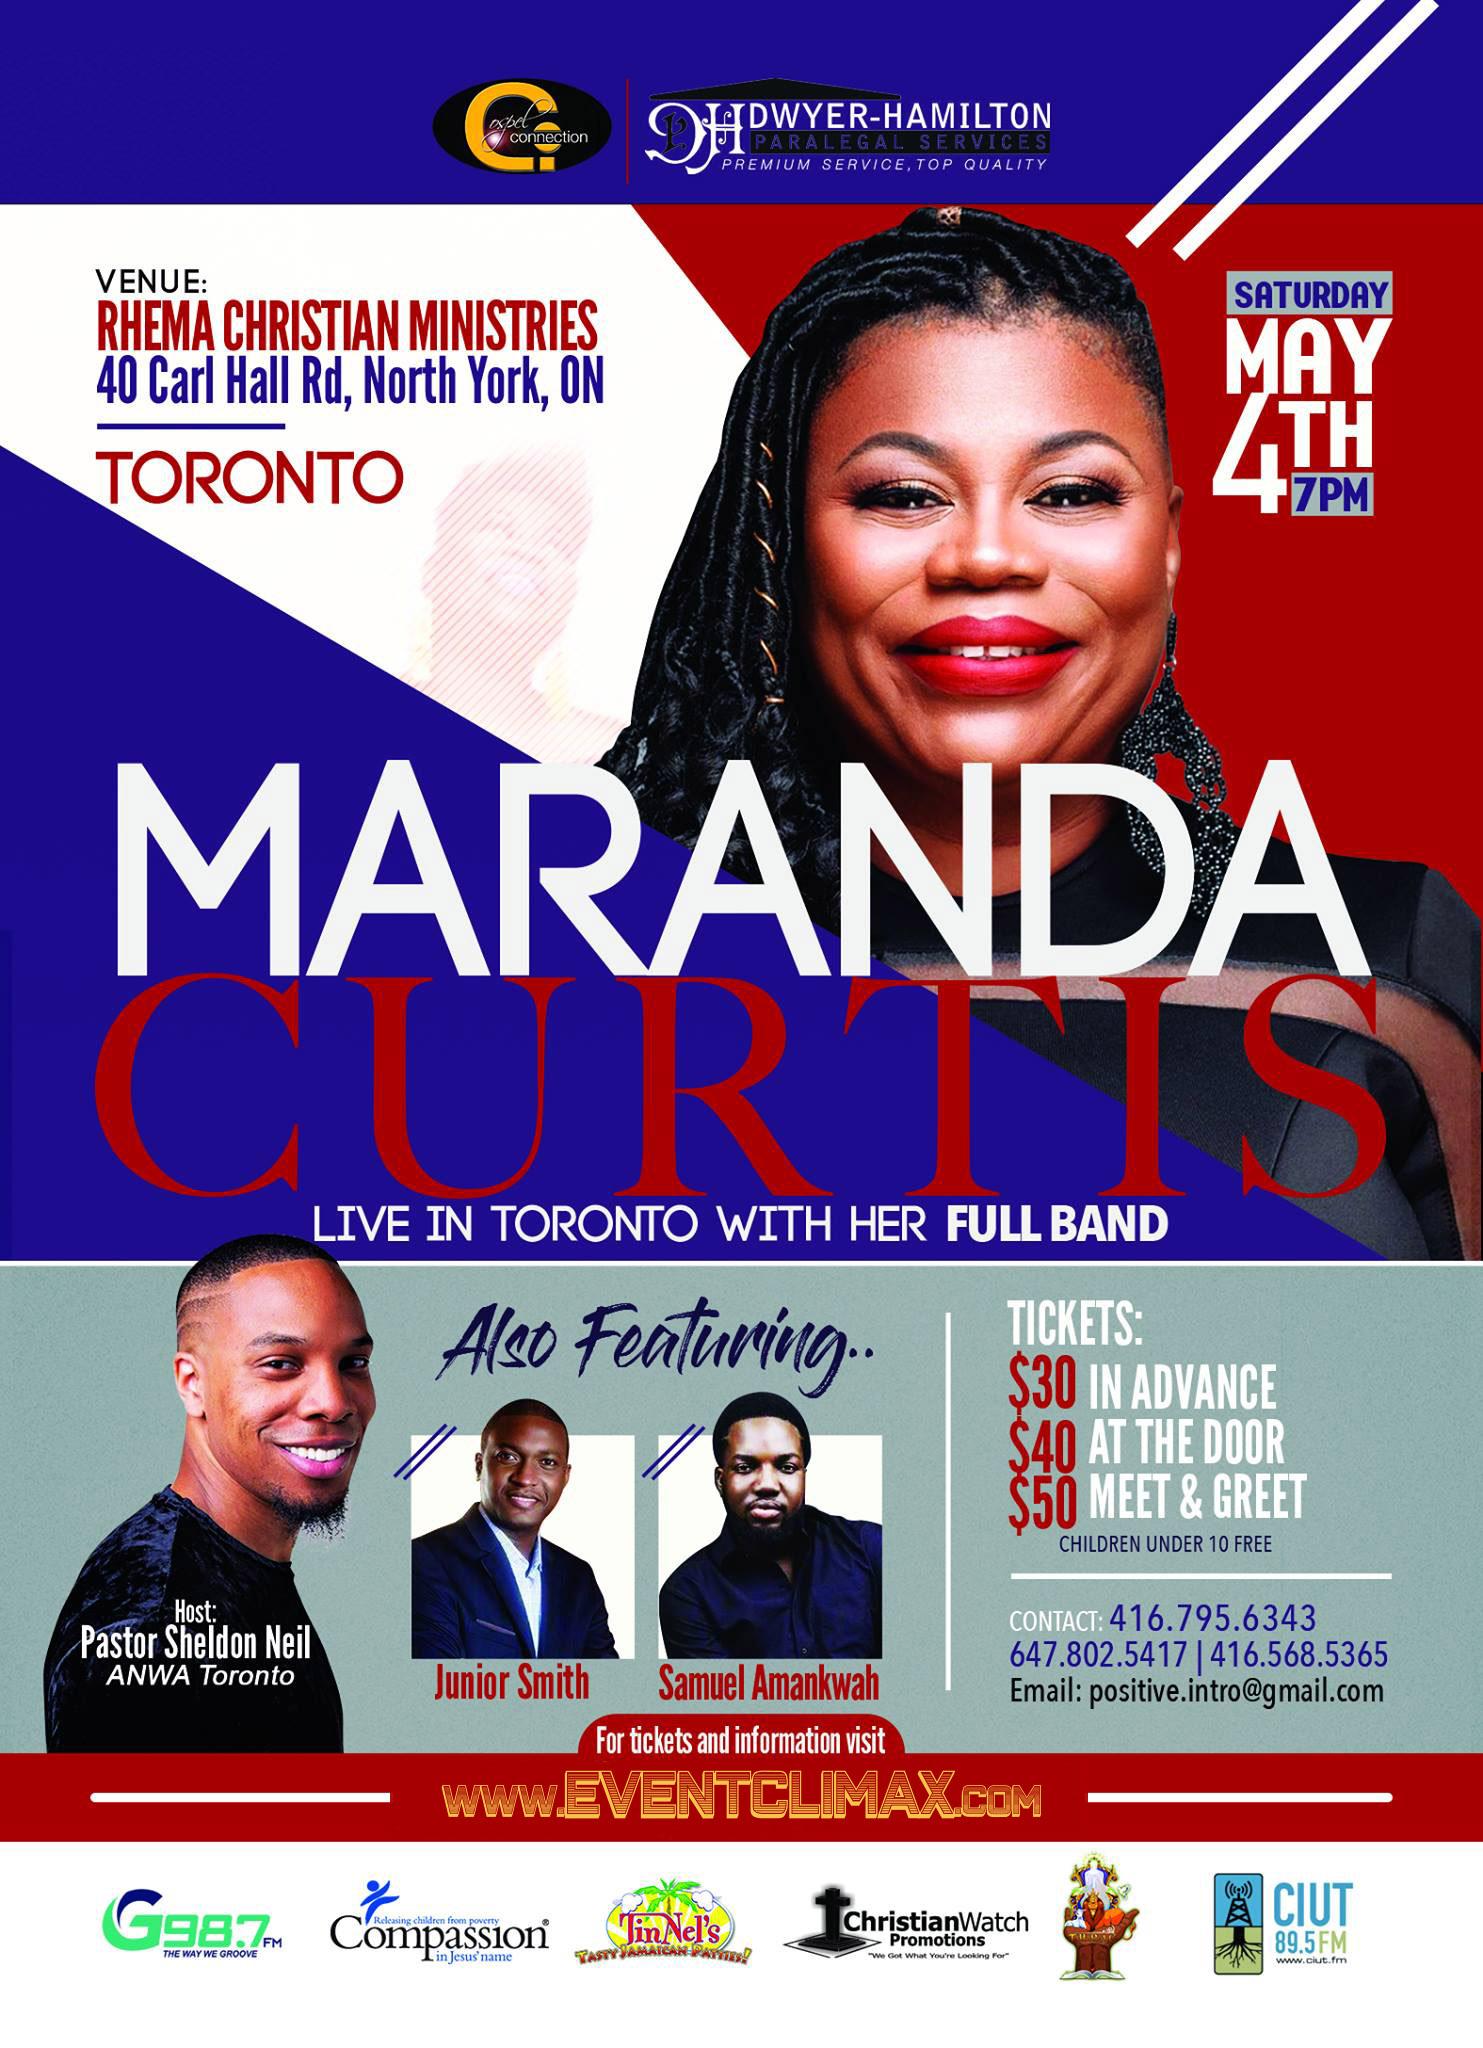 MARANDA CURTIS LIVE